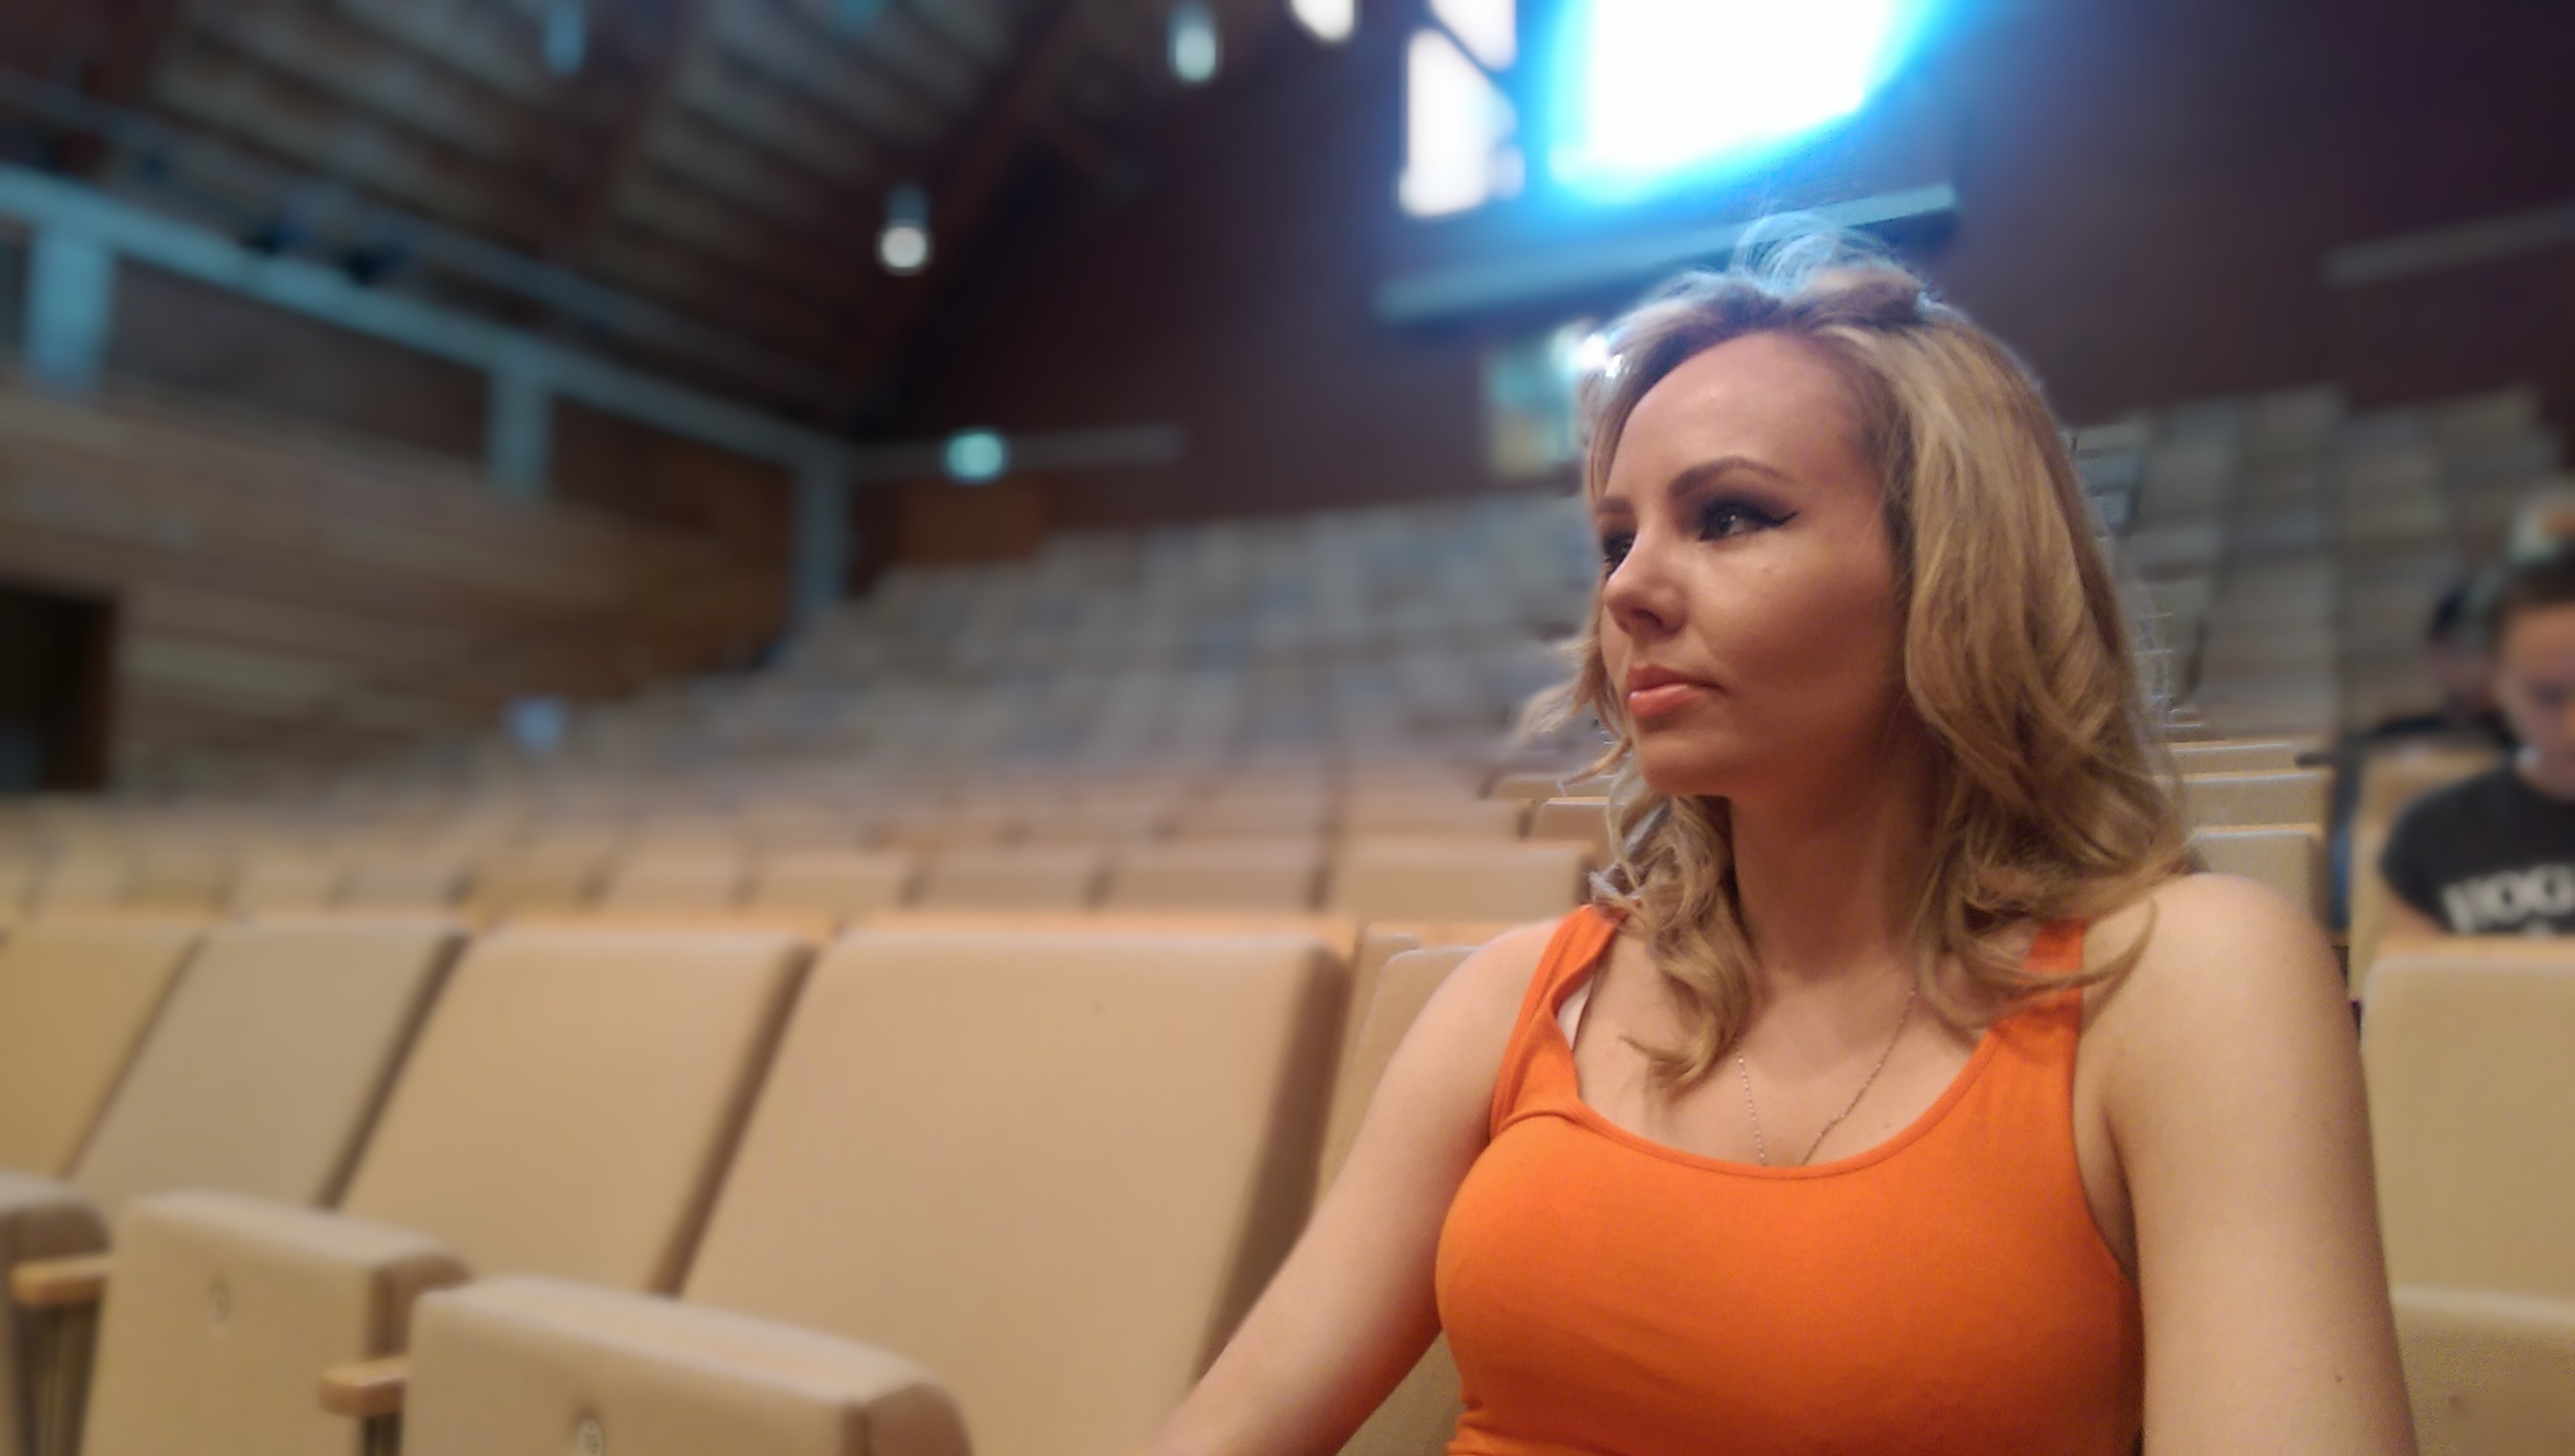 Jenna in rehearsals